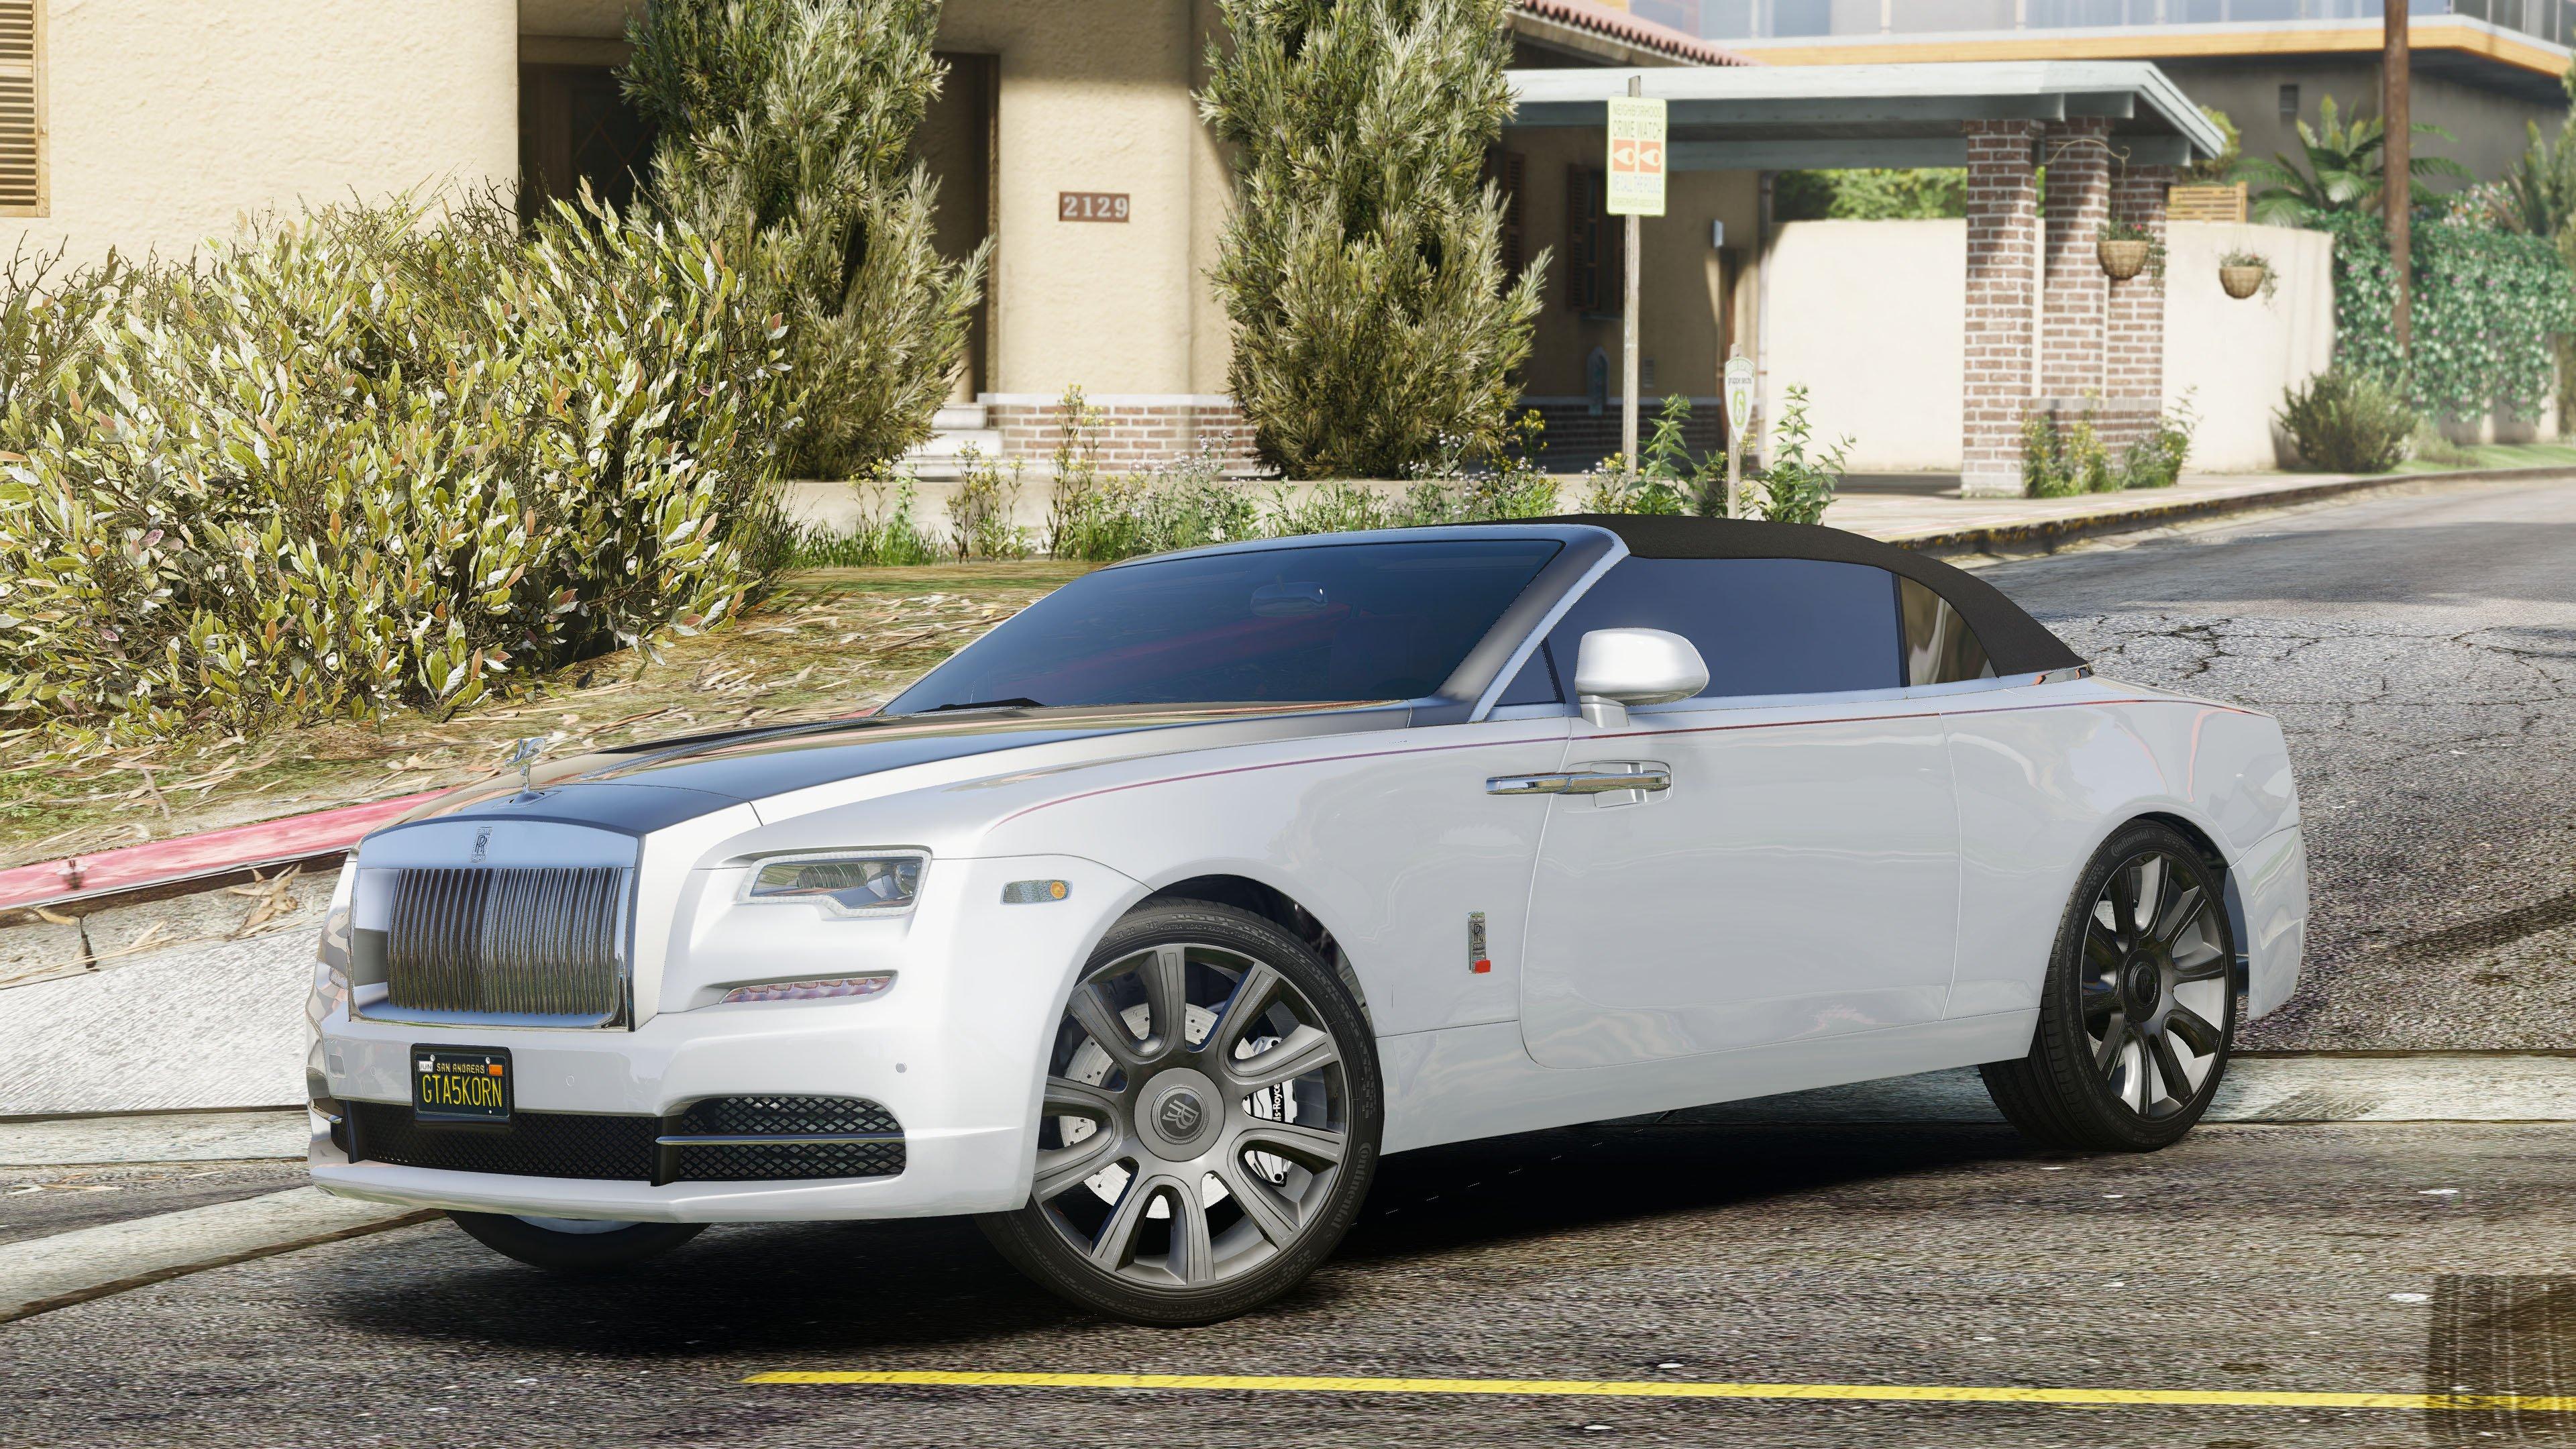 Rolls Royce Dawn 2017 Vehicules Pour Gta V Sur Gta Modding